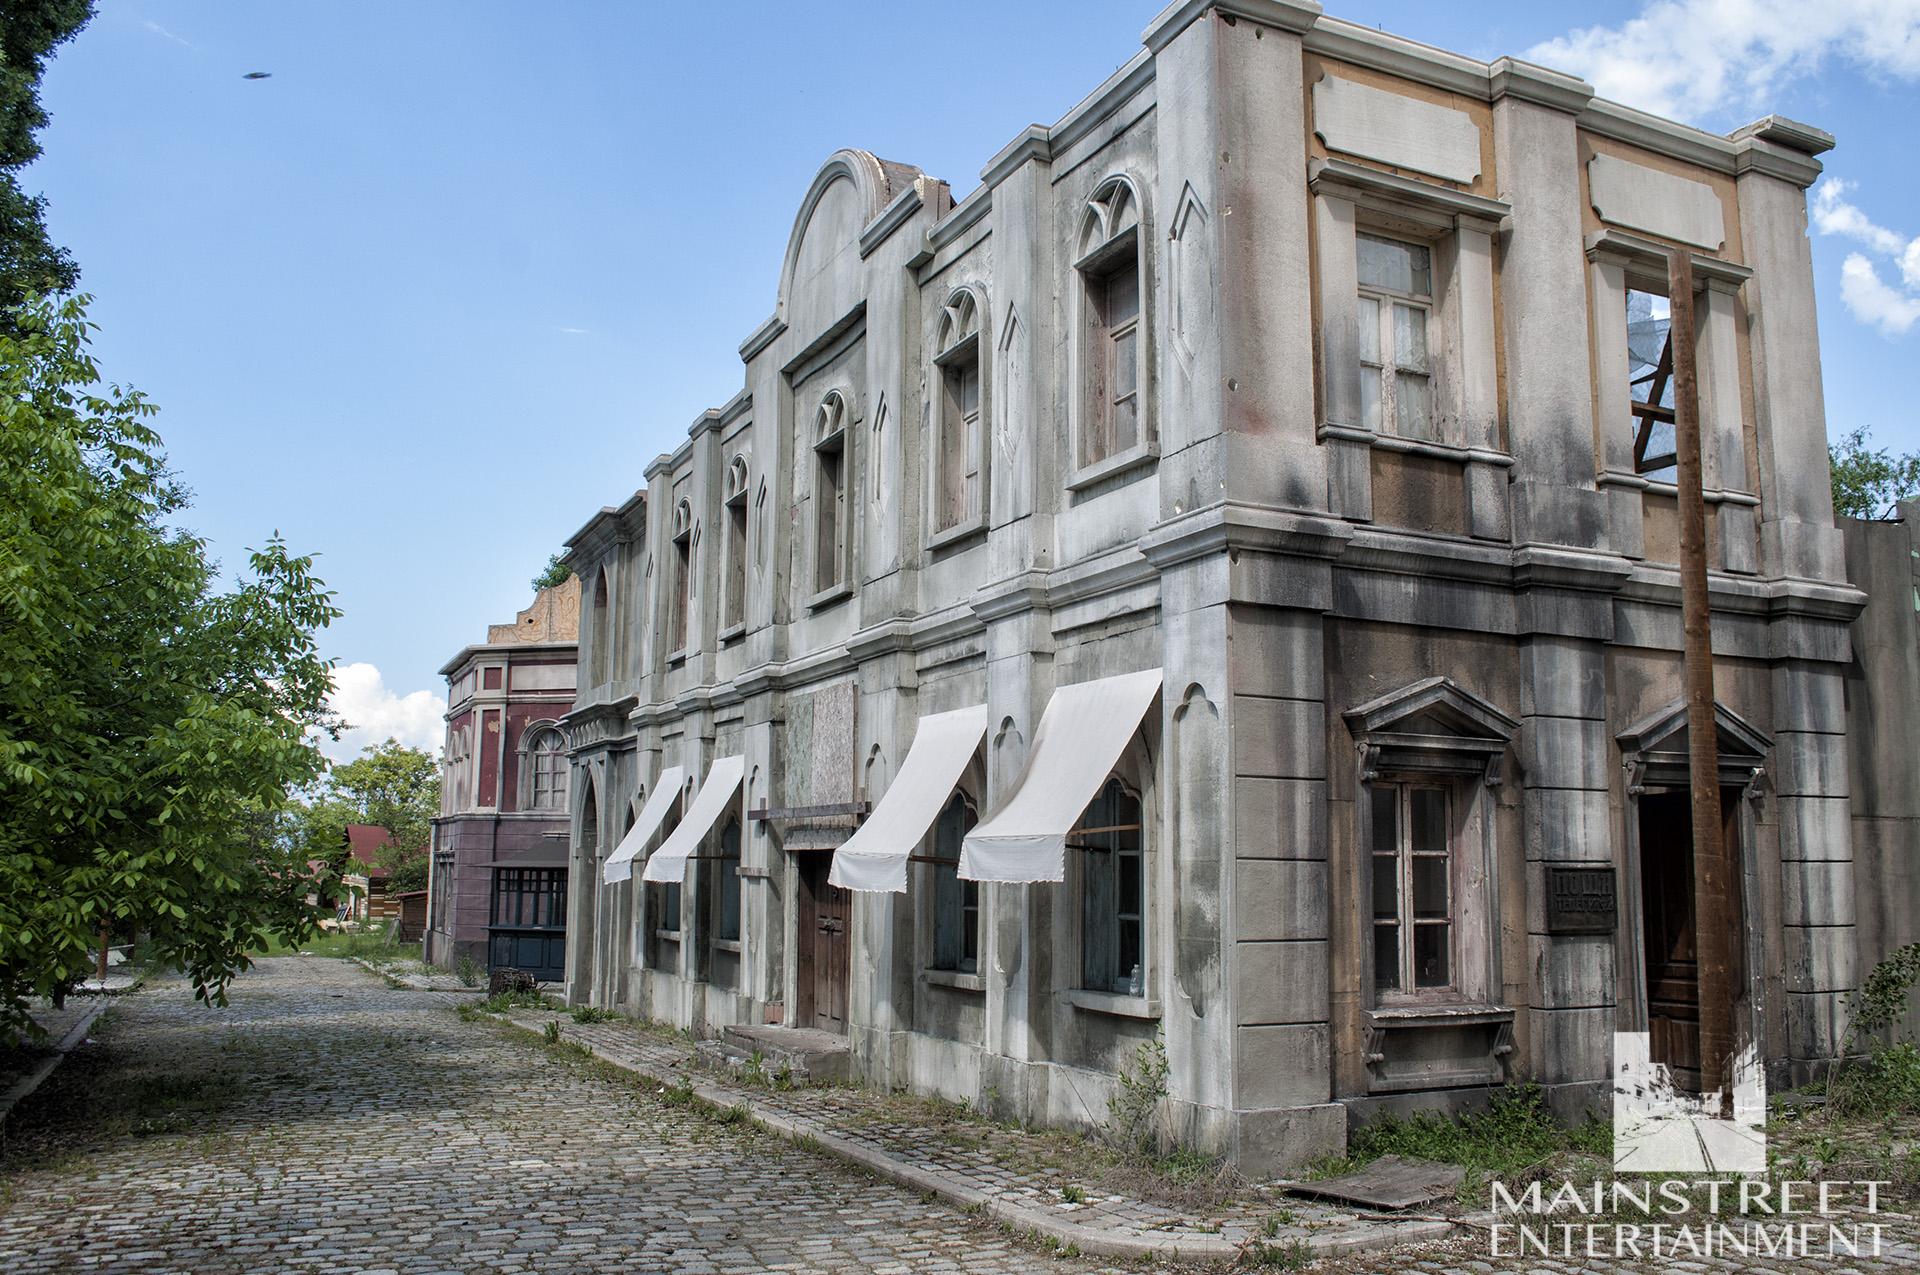 period buildings set